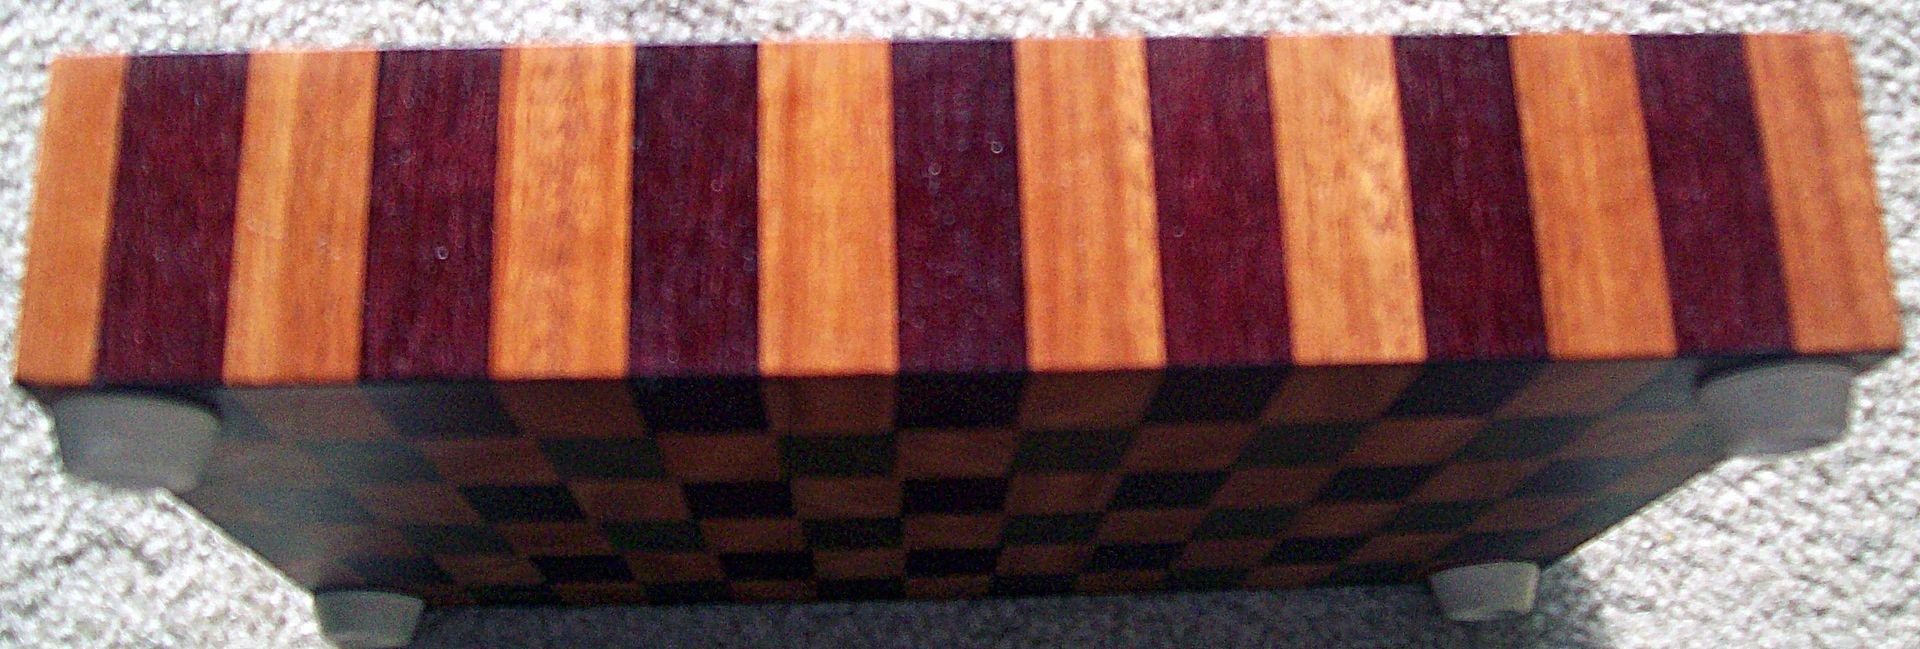 Handmade Mahogany Walnut Purple Heart End Grain Board By Jlb Woodworking Amp Carpentry